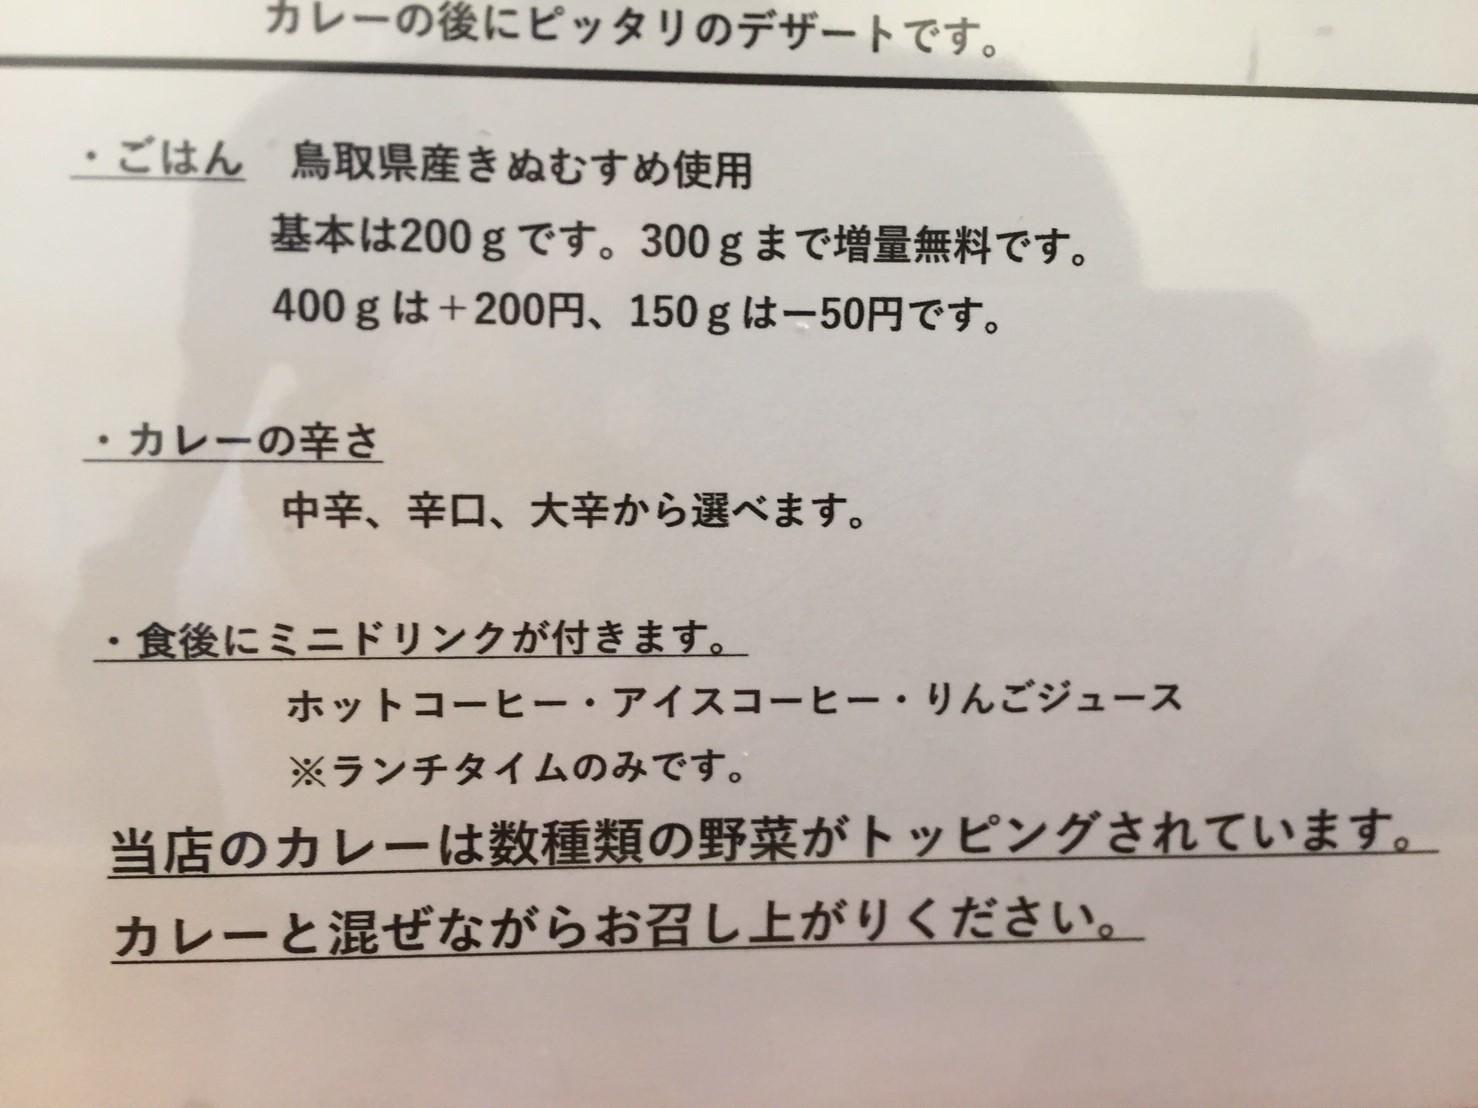 PARAKEET 限定カレー (金沢カレー風 ポークカツカレー)_e0115904_12402915.jpg